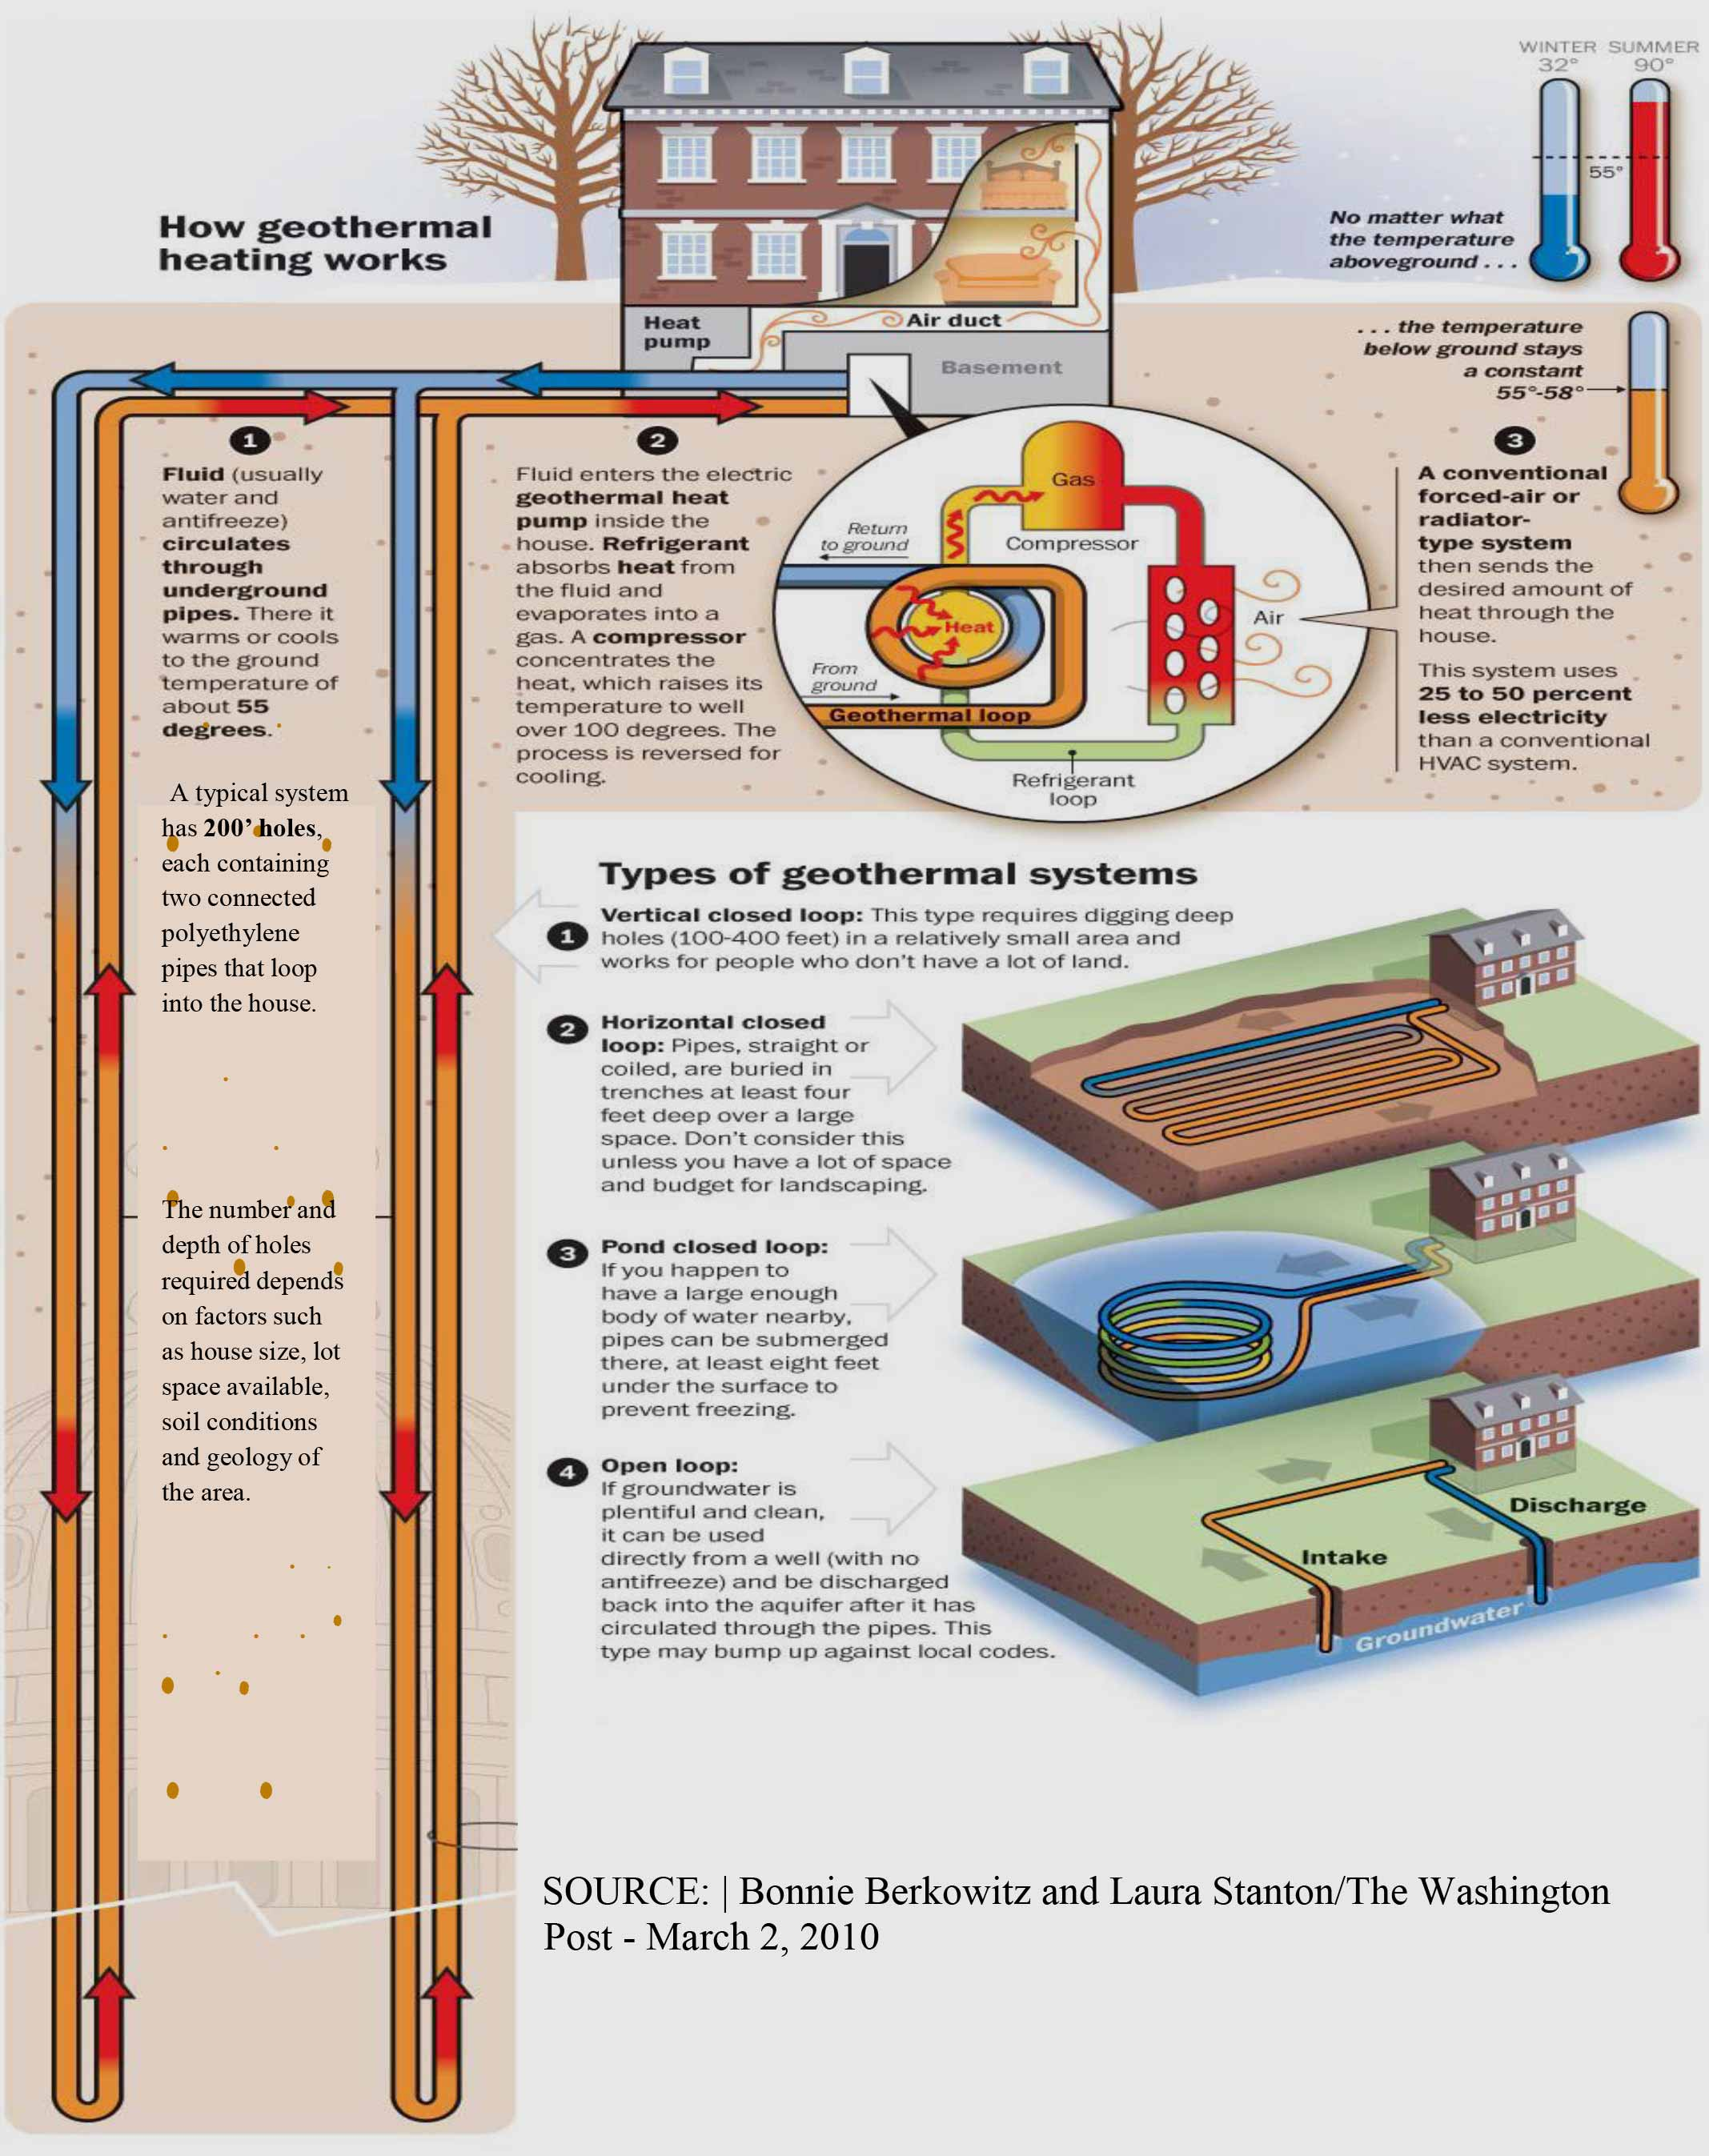 Geothermal diagram